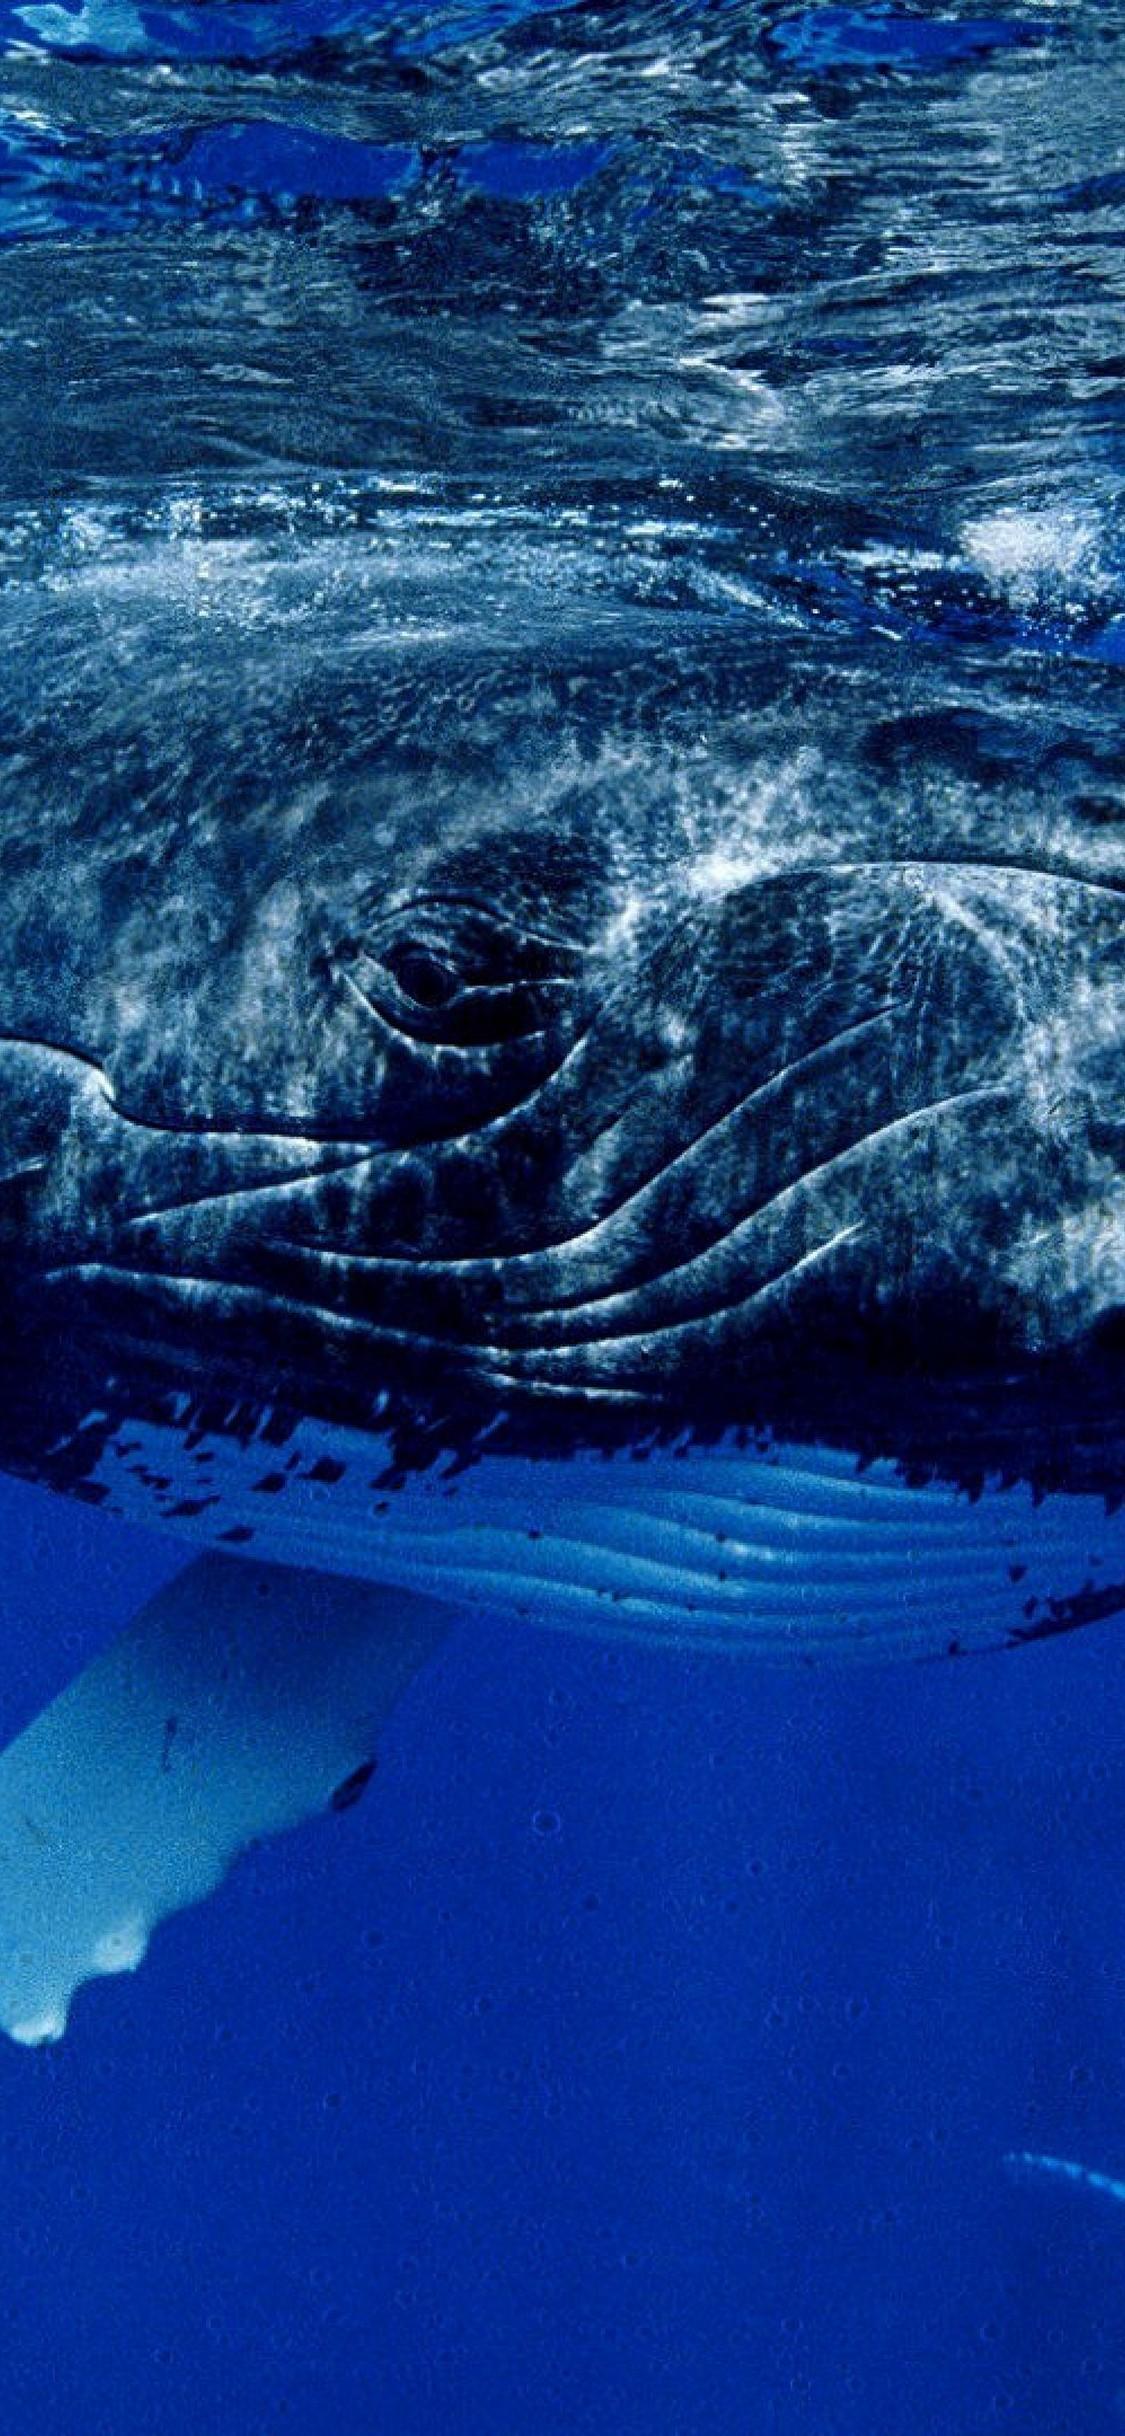 iPhone wallpaper sea whale Sea